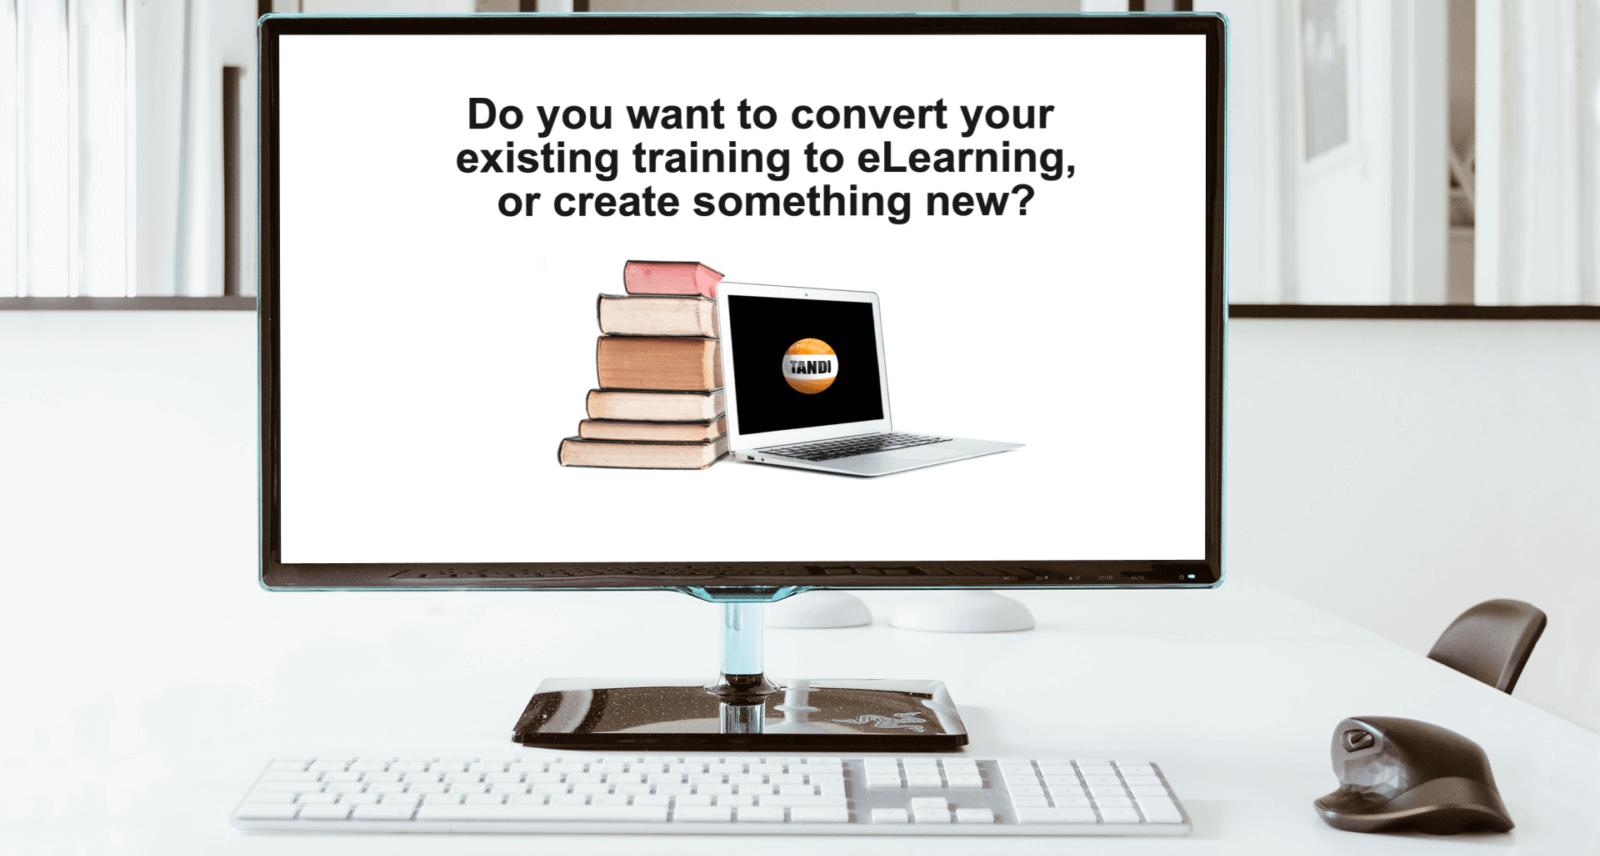 TANDI for customised training